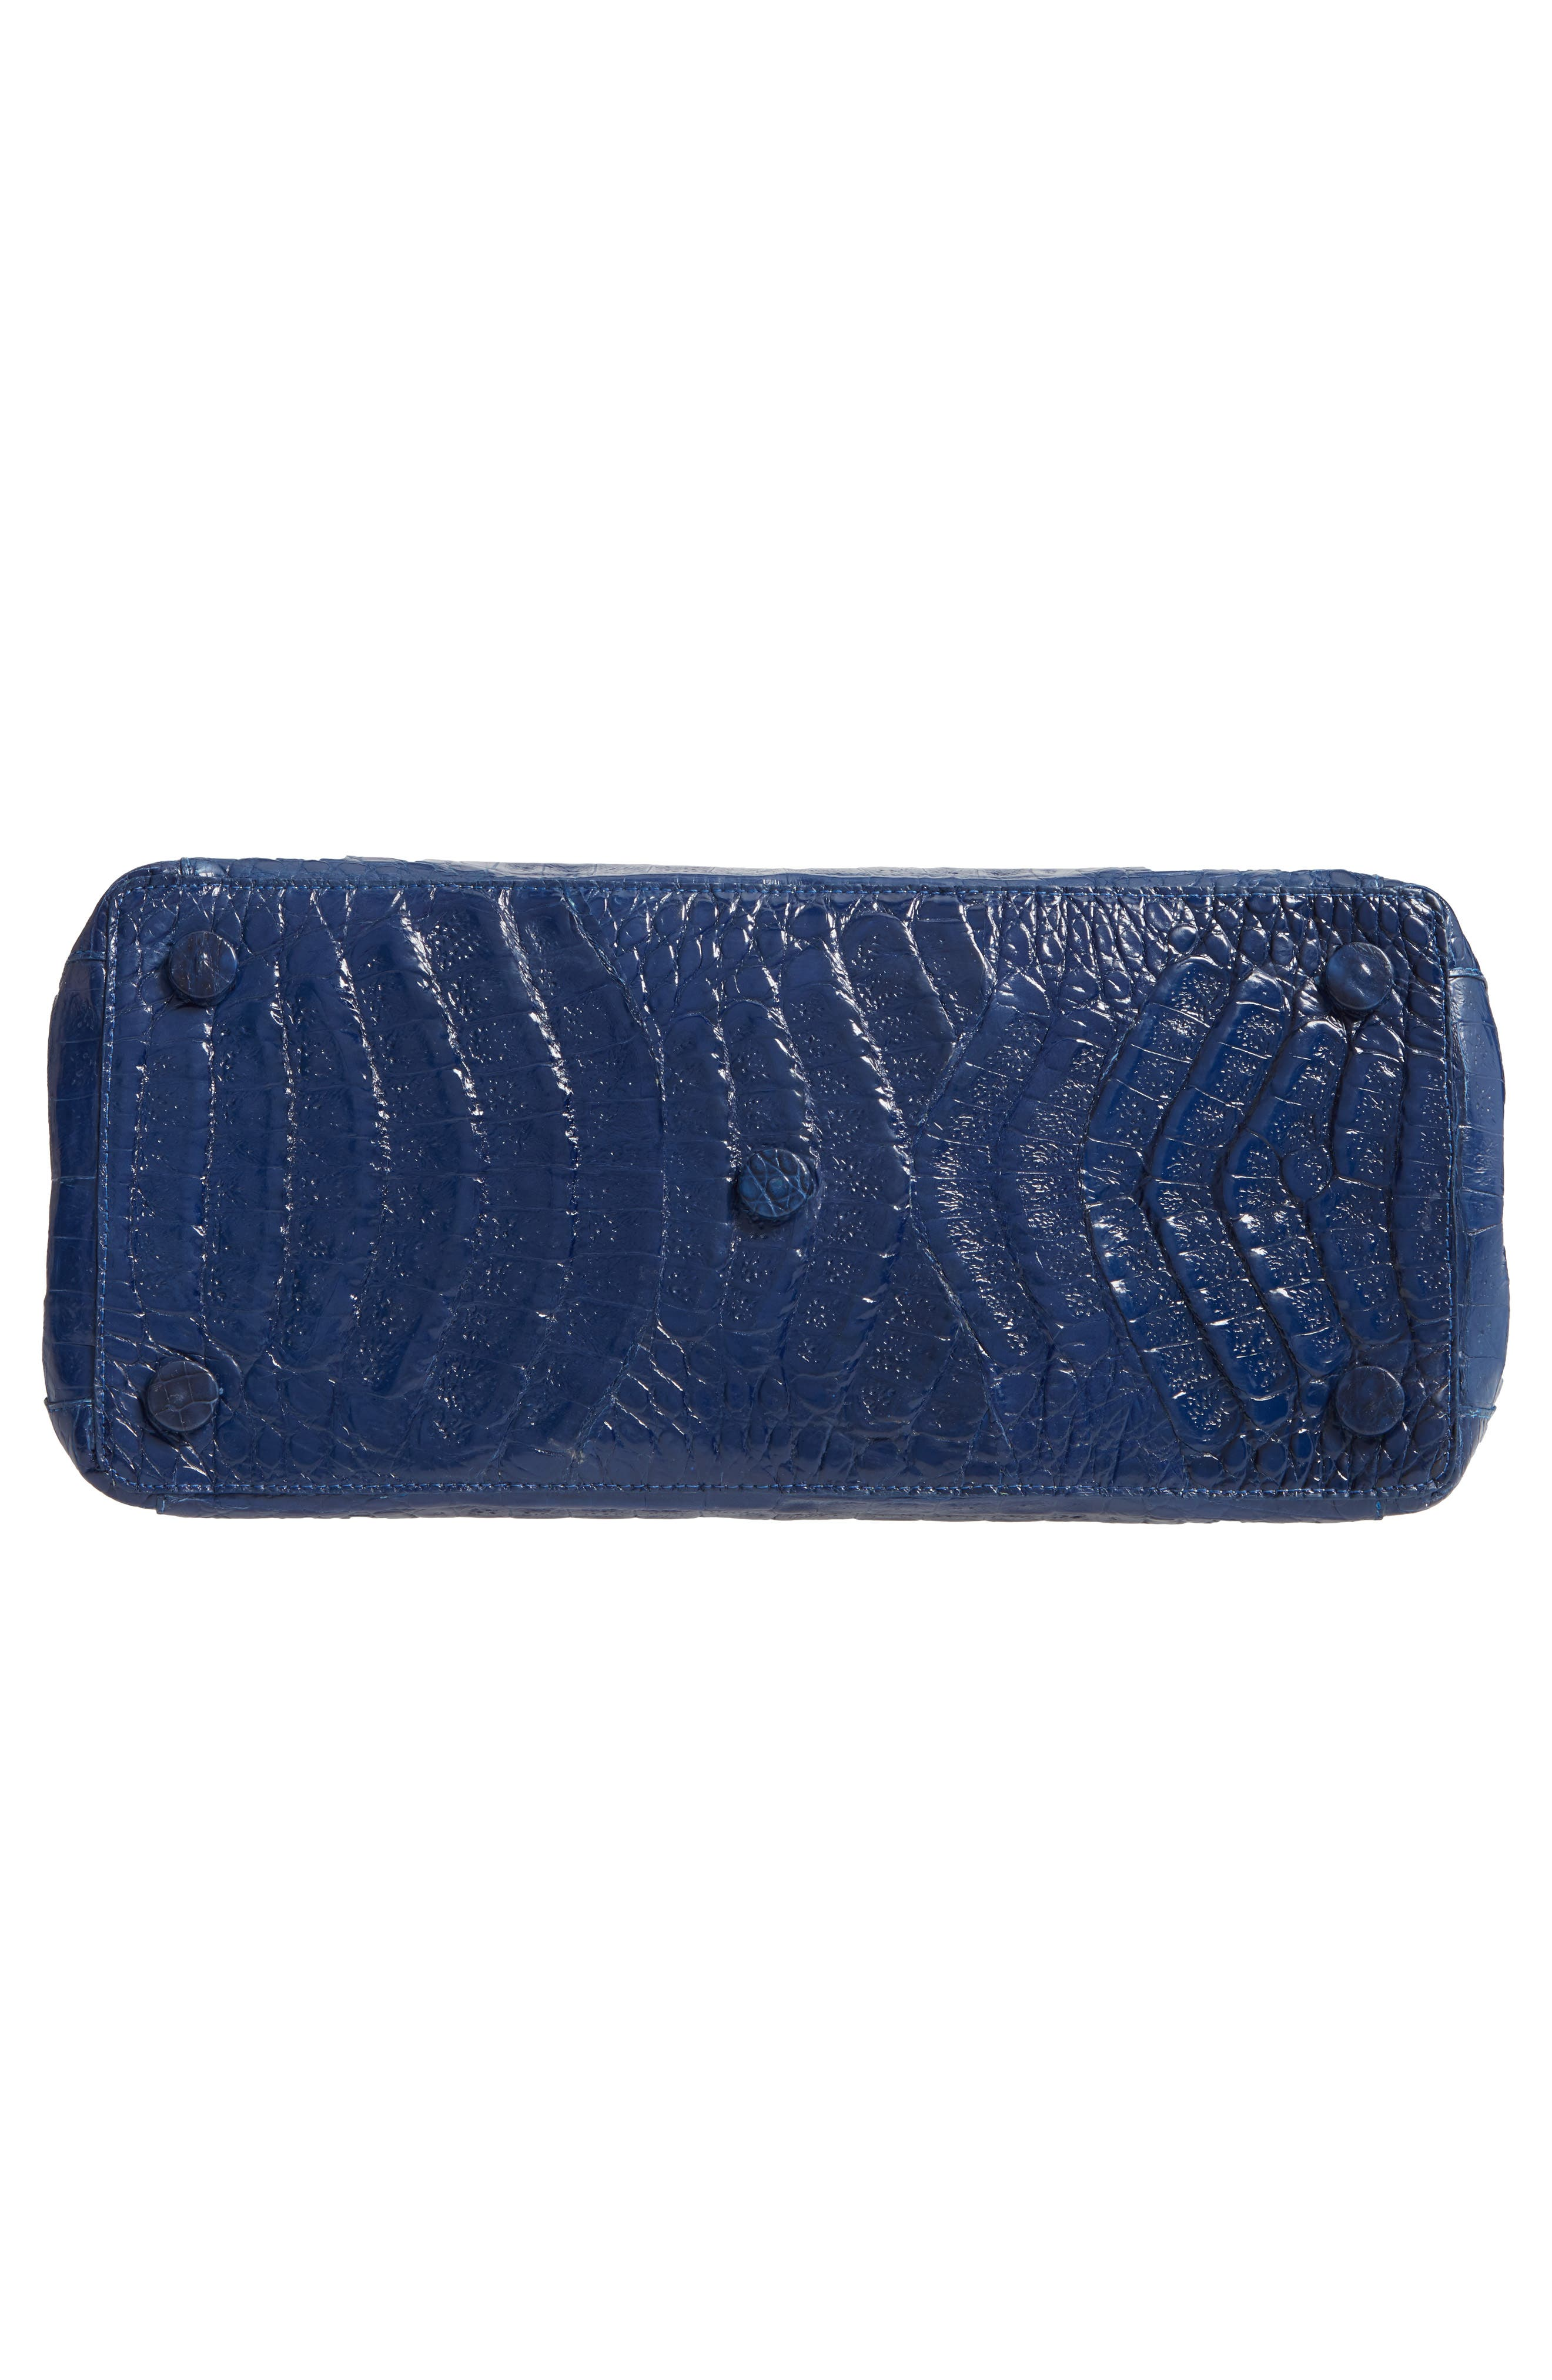 NANCY GONZALEZ, Medium Double Zip Genuine Crocodile Tote, Alternate thumbnail 6, color, BLUE DEGRADE